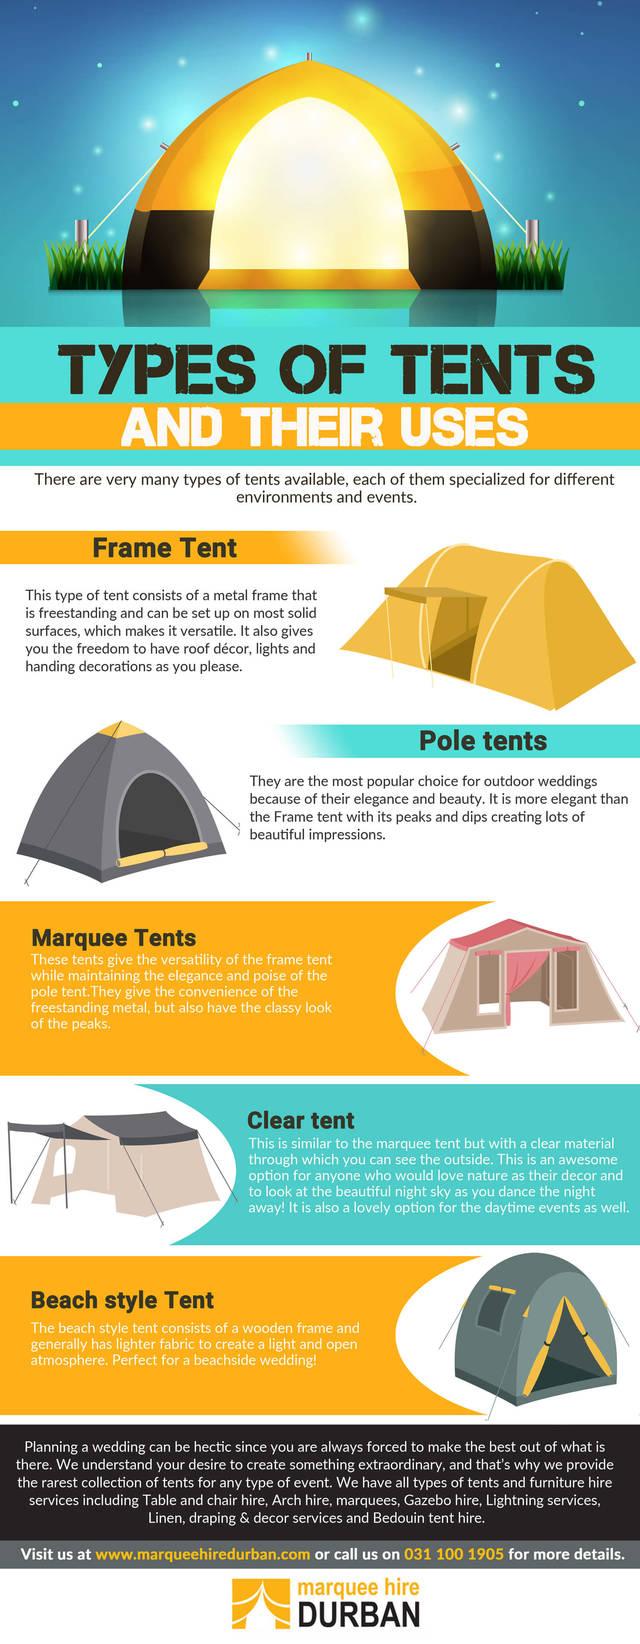 Infographic marqueehiredurban